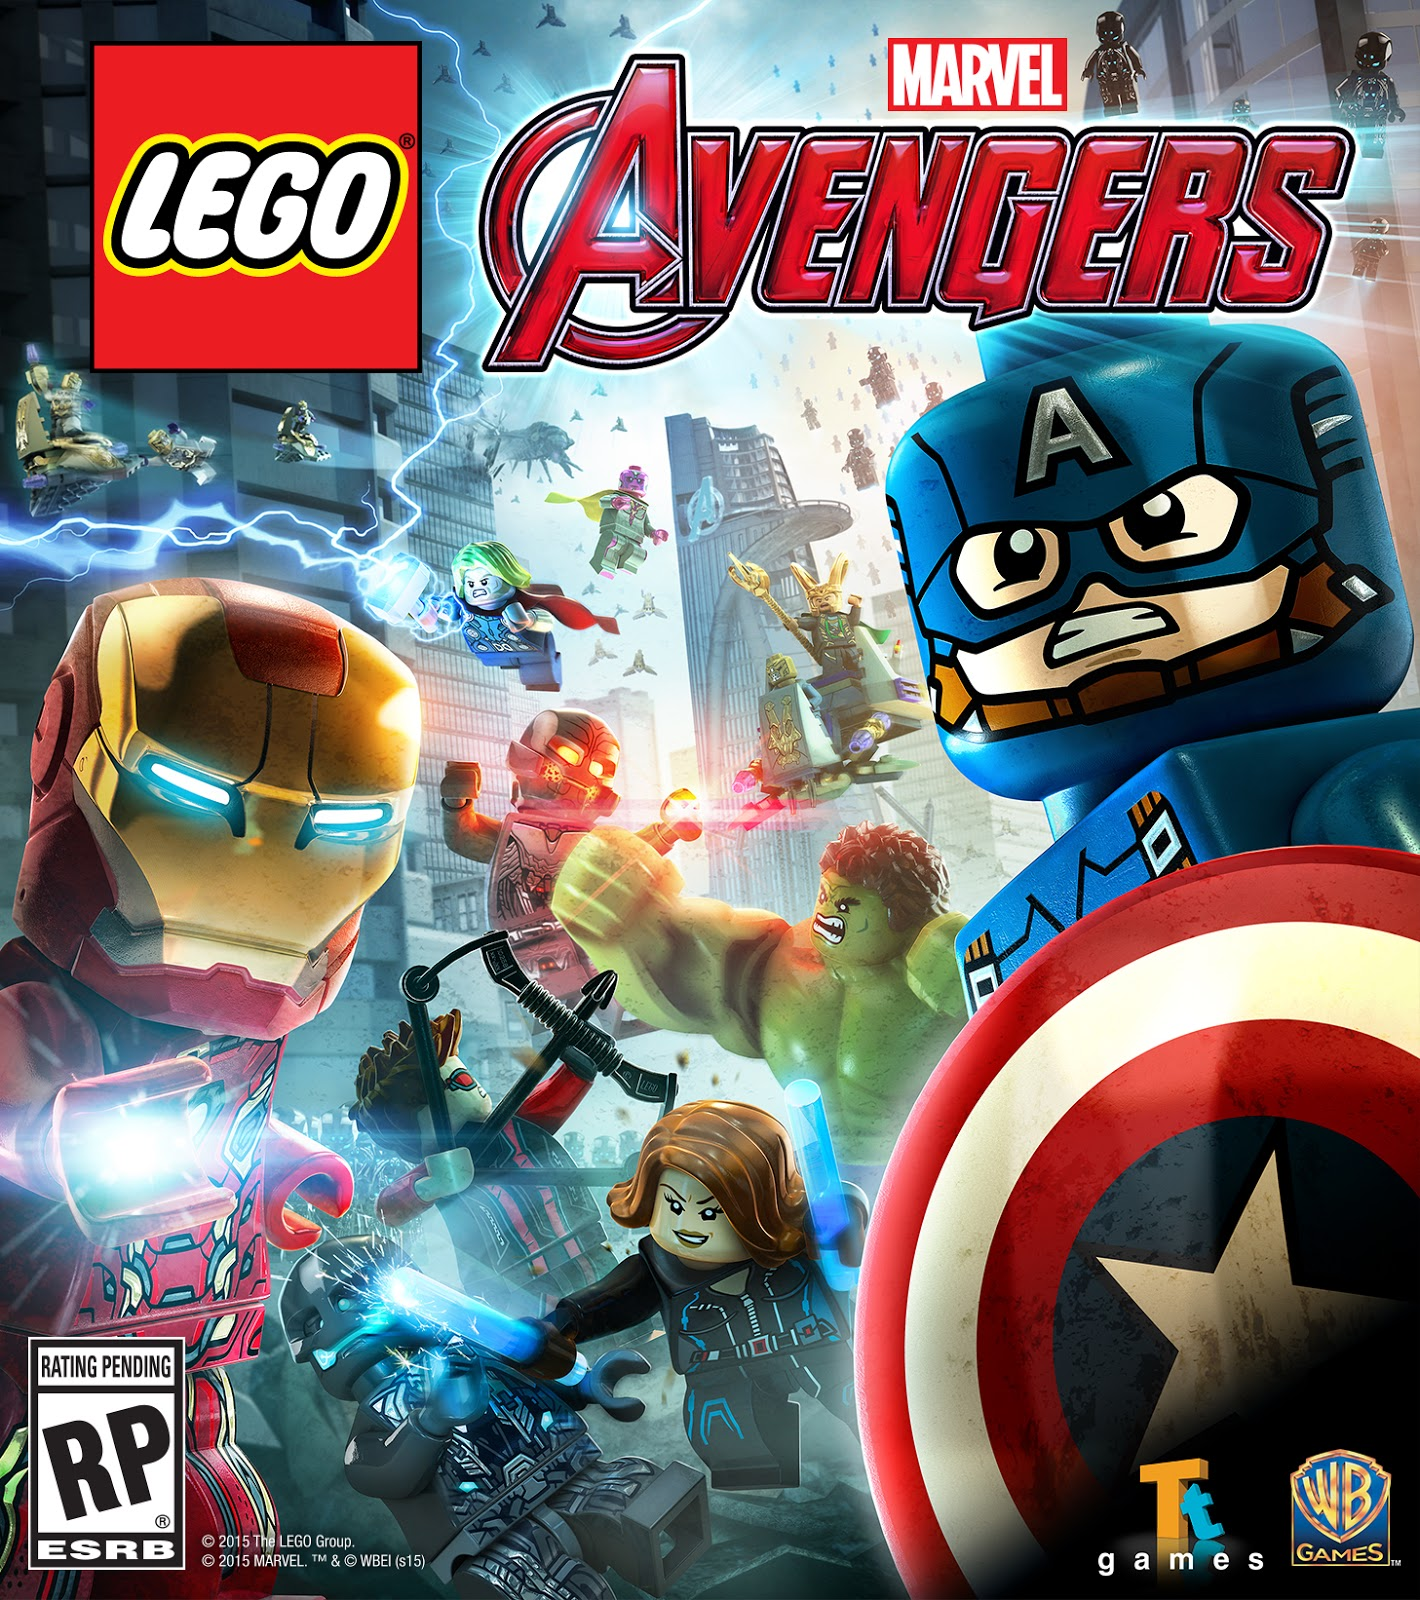 Lego Marvel's Avengers release date pushed back past holidays 2015 ...